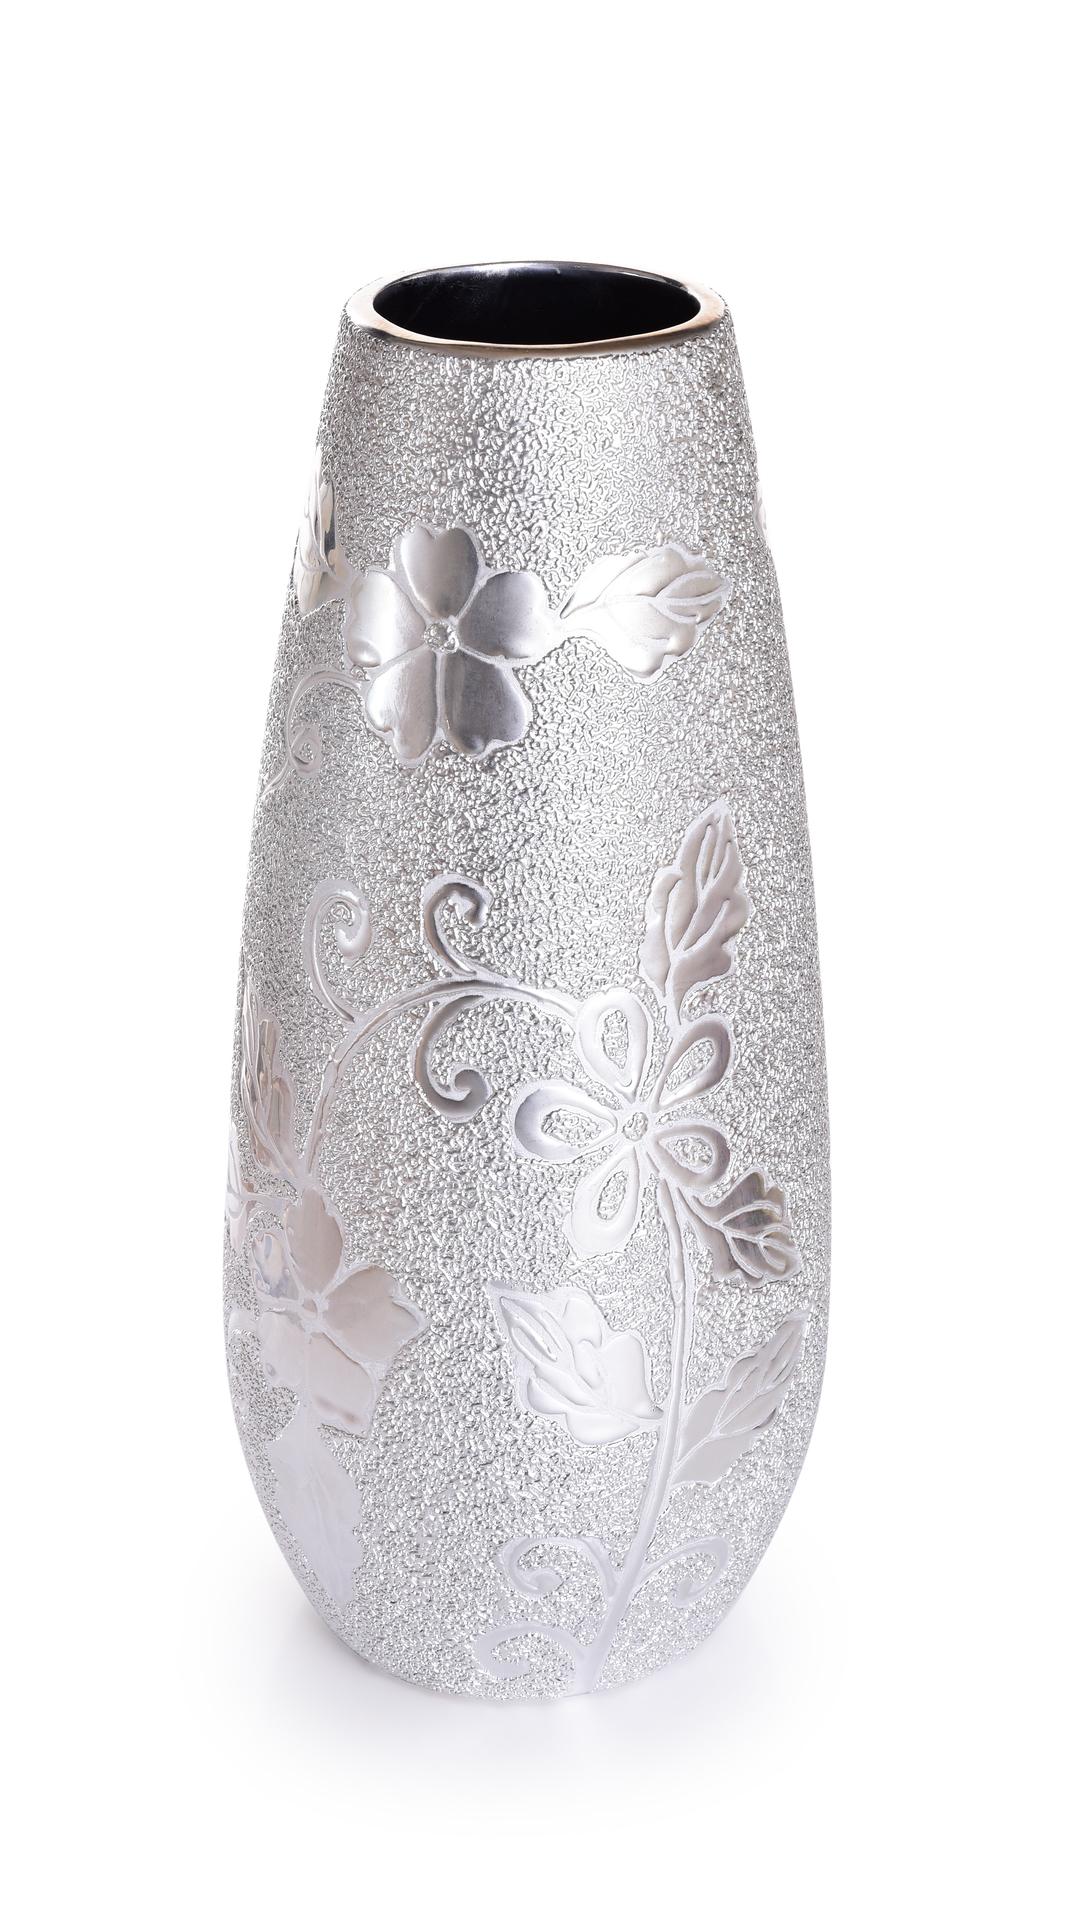 Dekorativní keramická váza